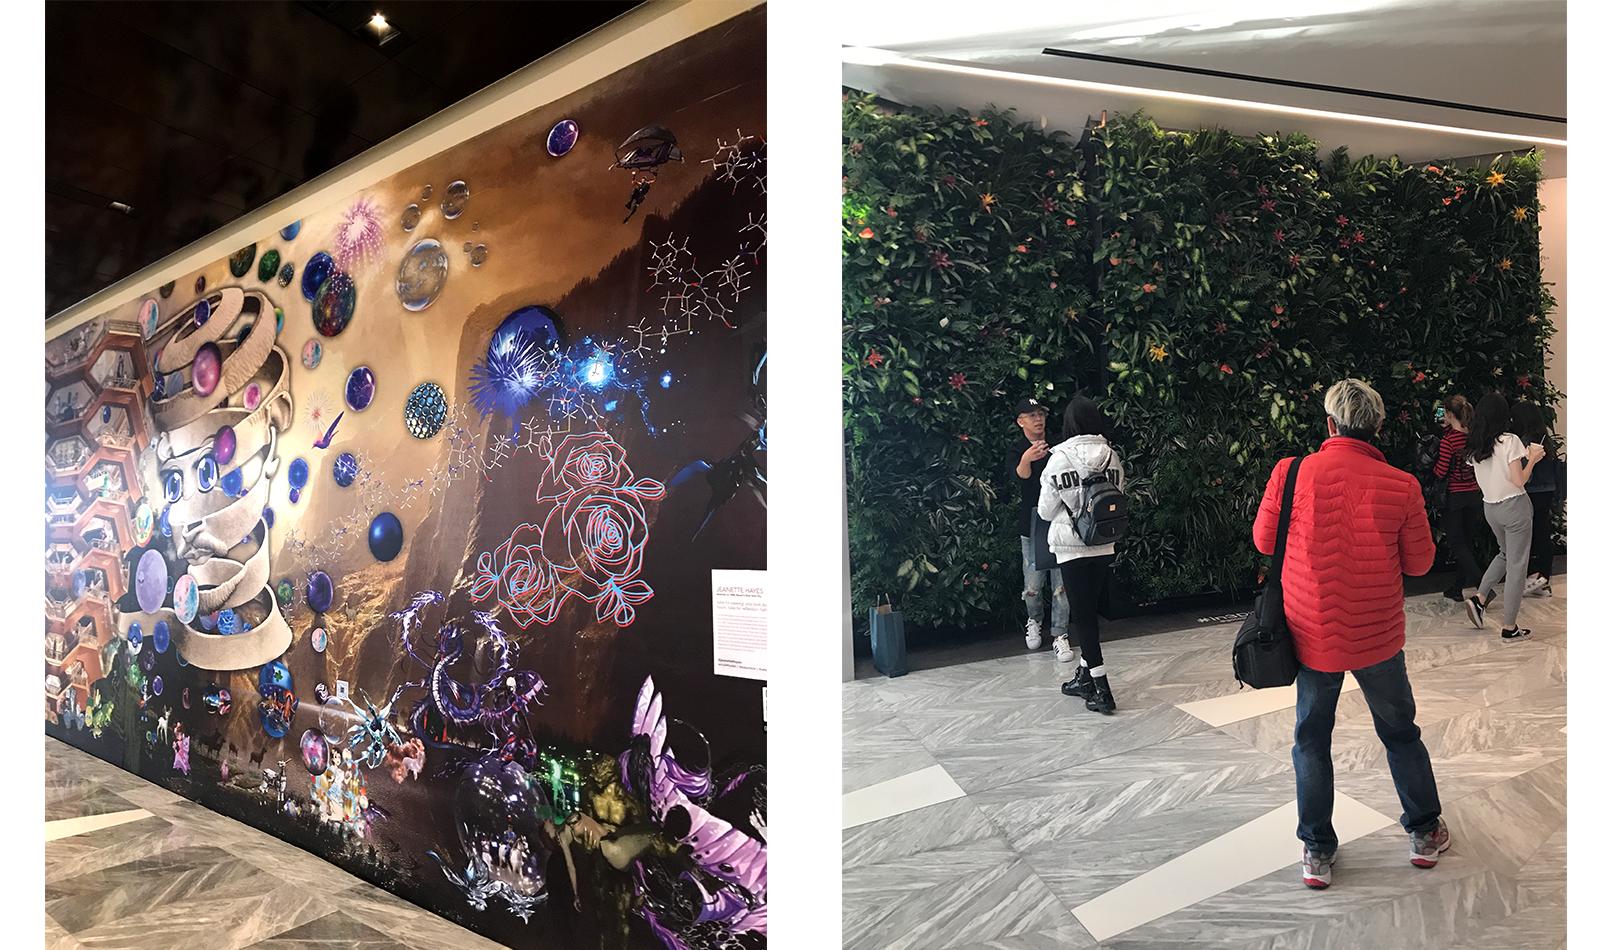 art-installations-plant-wall-selfie